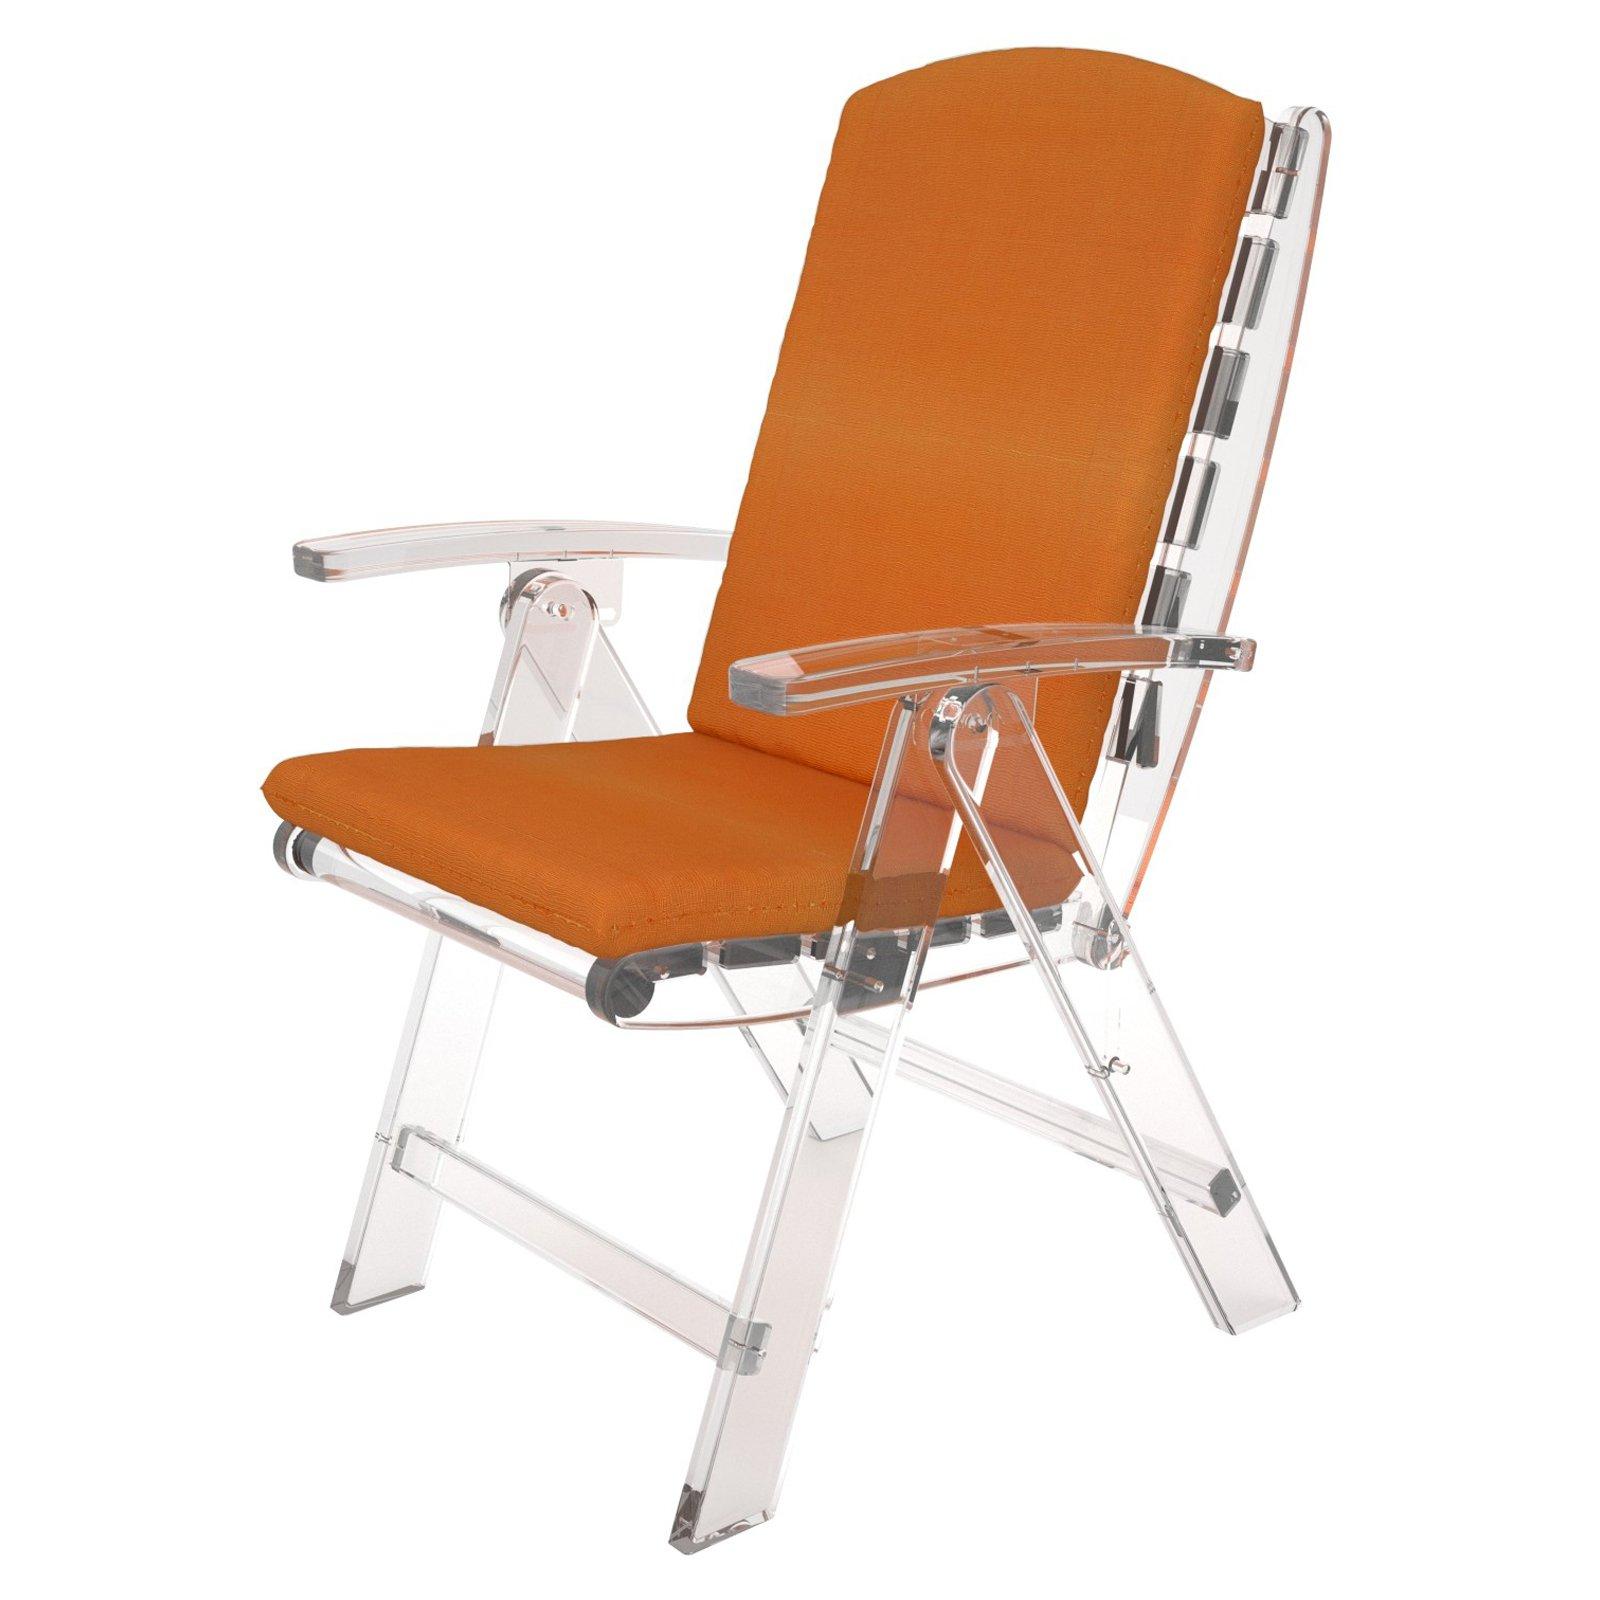 Trex Outdoor Furniture Sunbrella 40.25 in. Hinged Full Chair Cushion